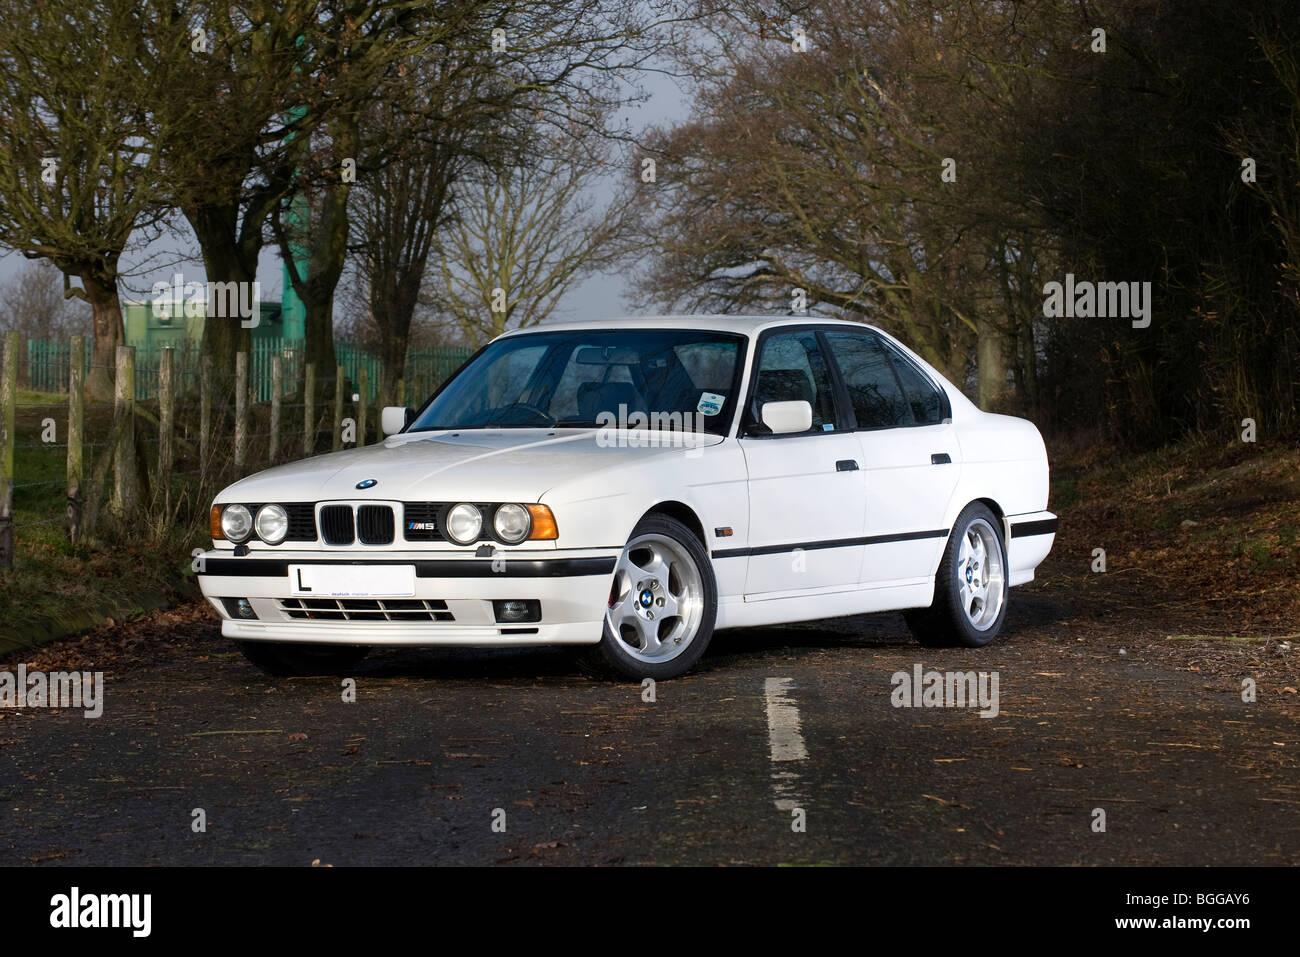 BMW M5 E34 shape - 1988 to 1996 - high performance luxury saloon car - Stock Image